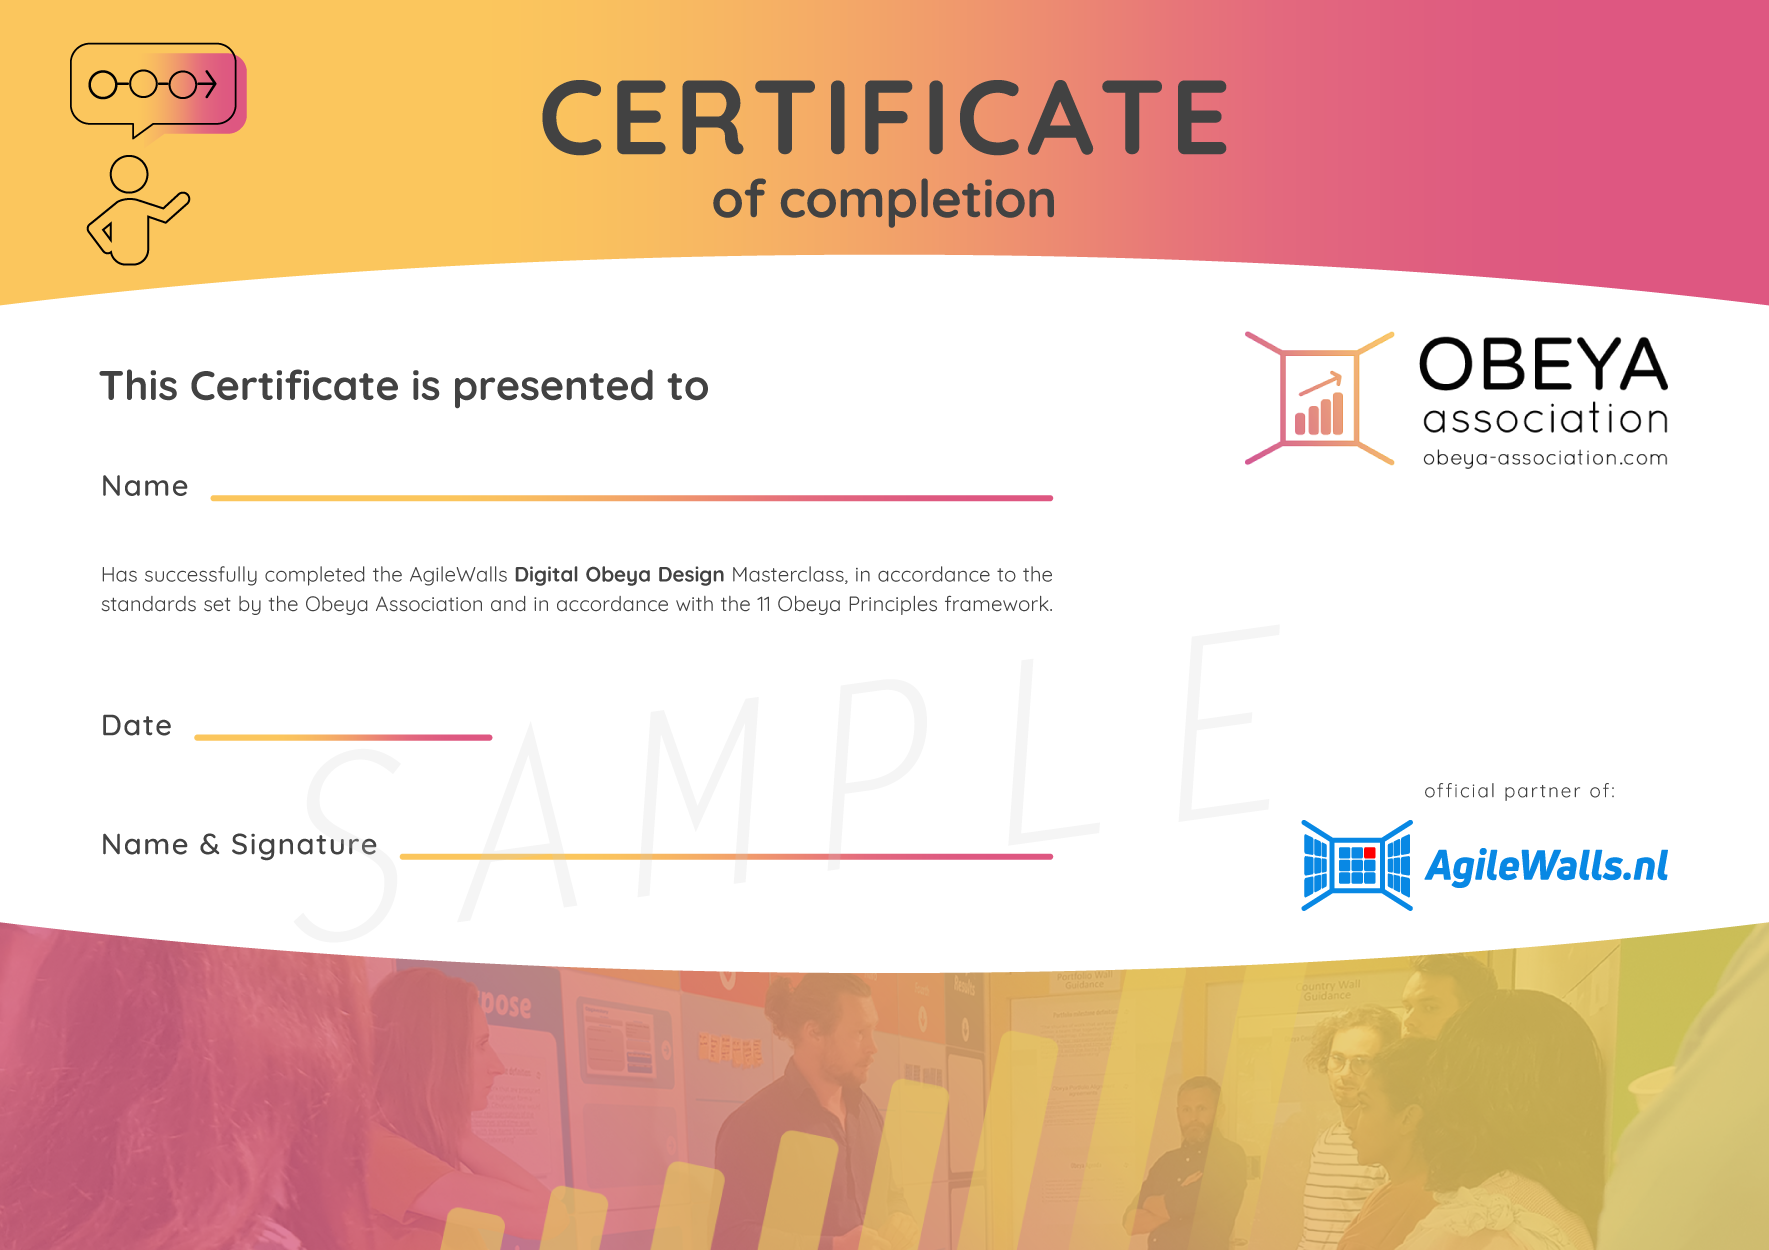 AgileWalls Obeya Association Certificate